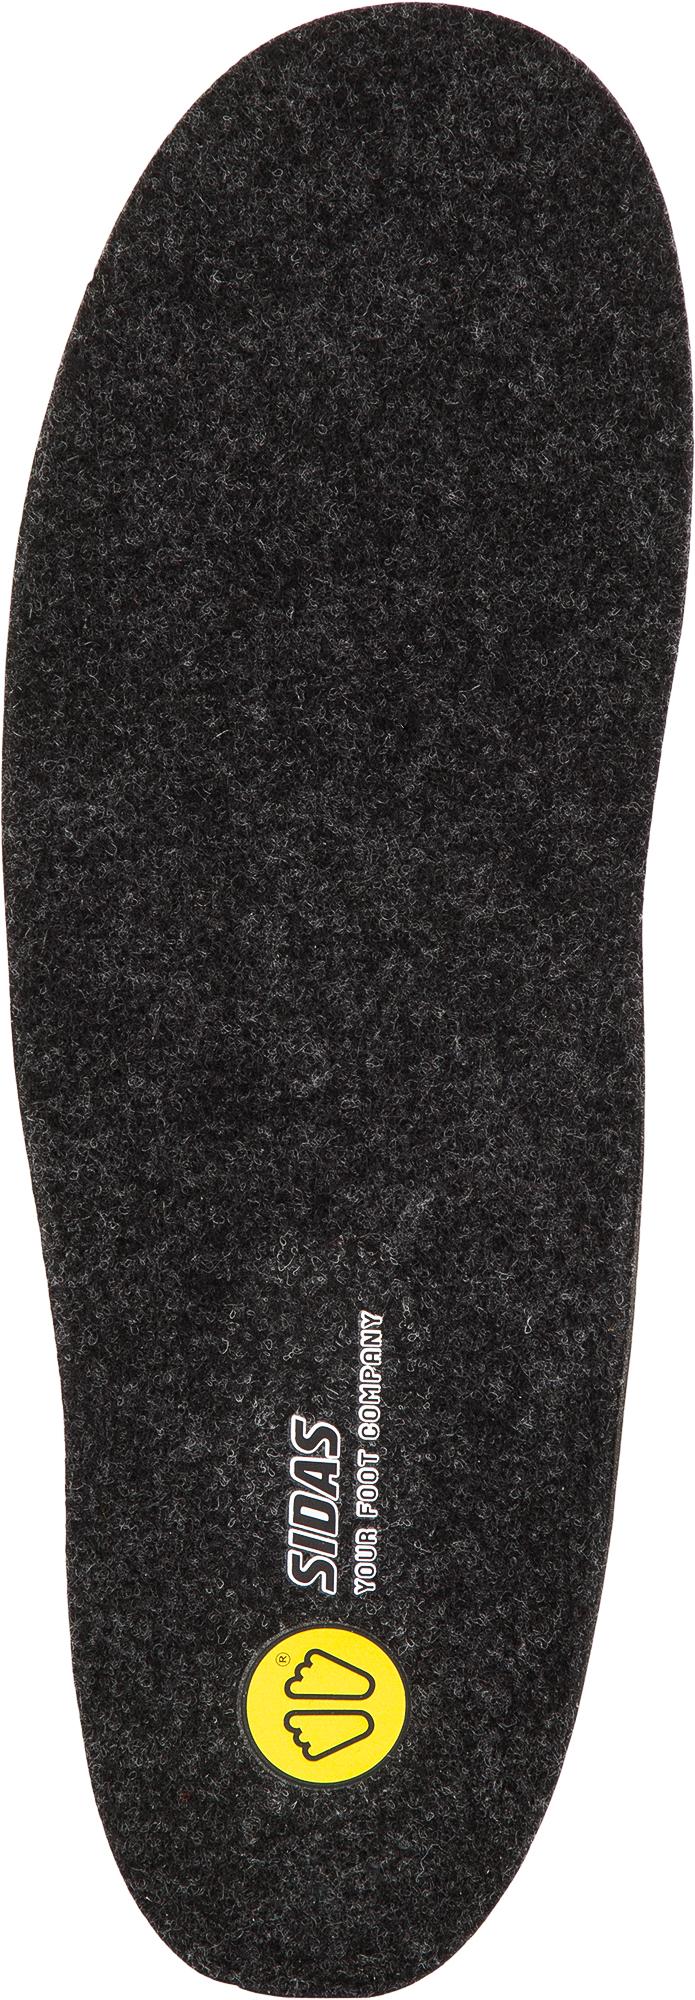 Фото - Sidas Стельки Sidas FlashFit Winter+ Comfort Merino, размер 34.5-36 dormeo merino